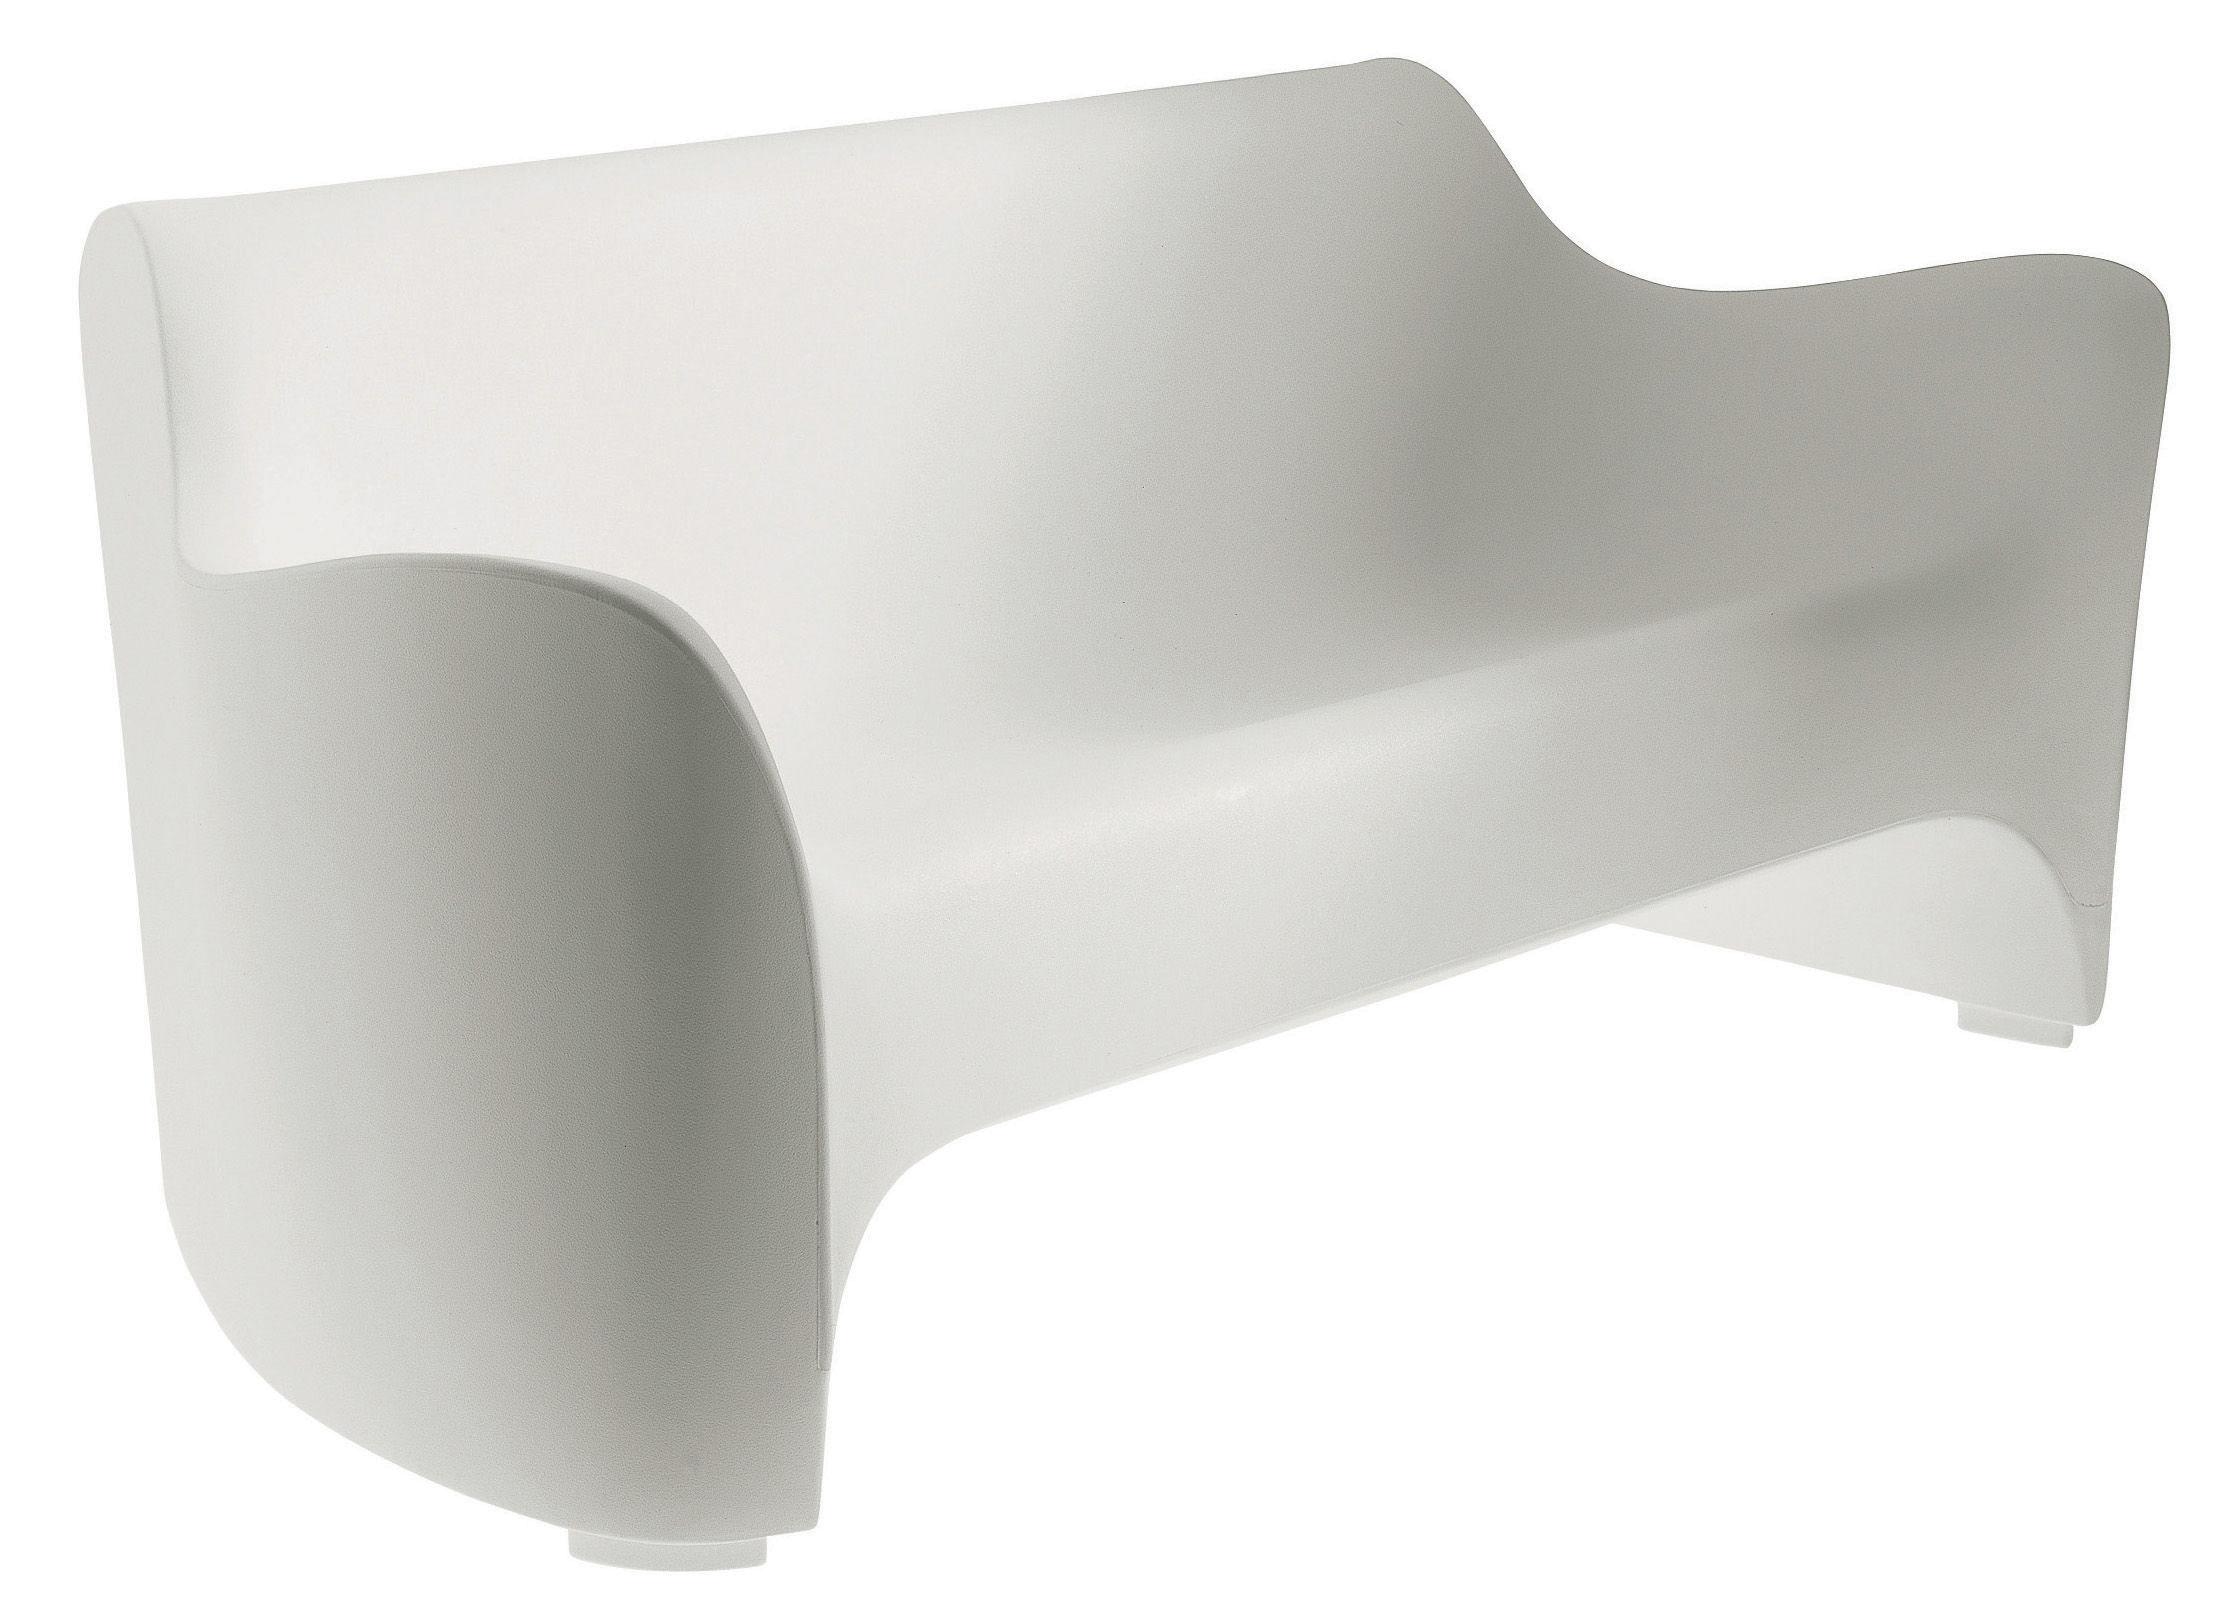 Outdoor - Sofas - Tokyo Pop Straight sofa by Driade - White - Polythene